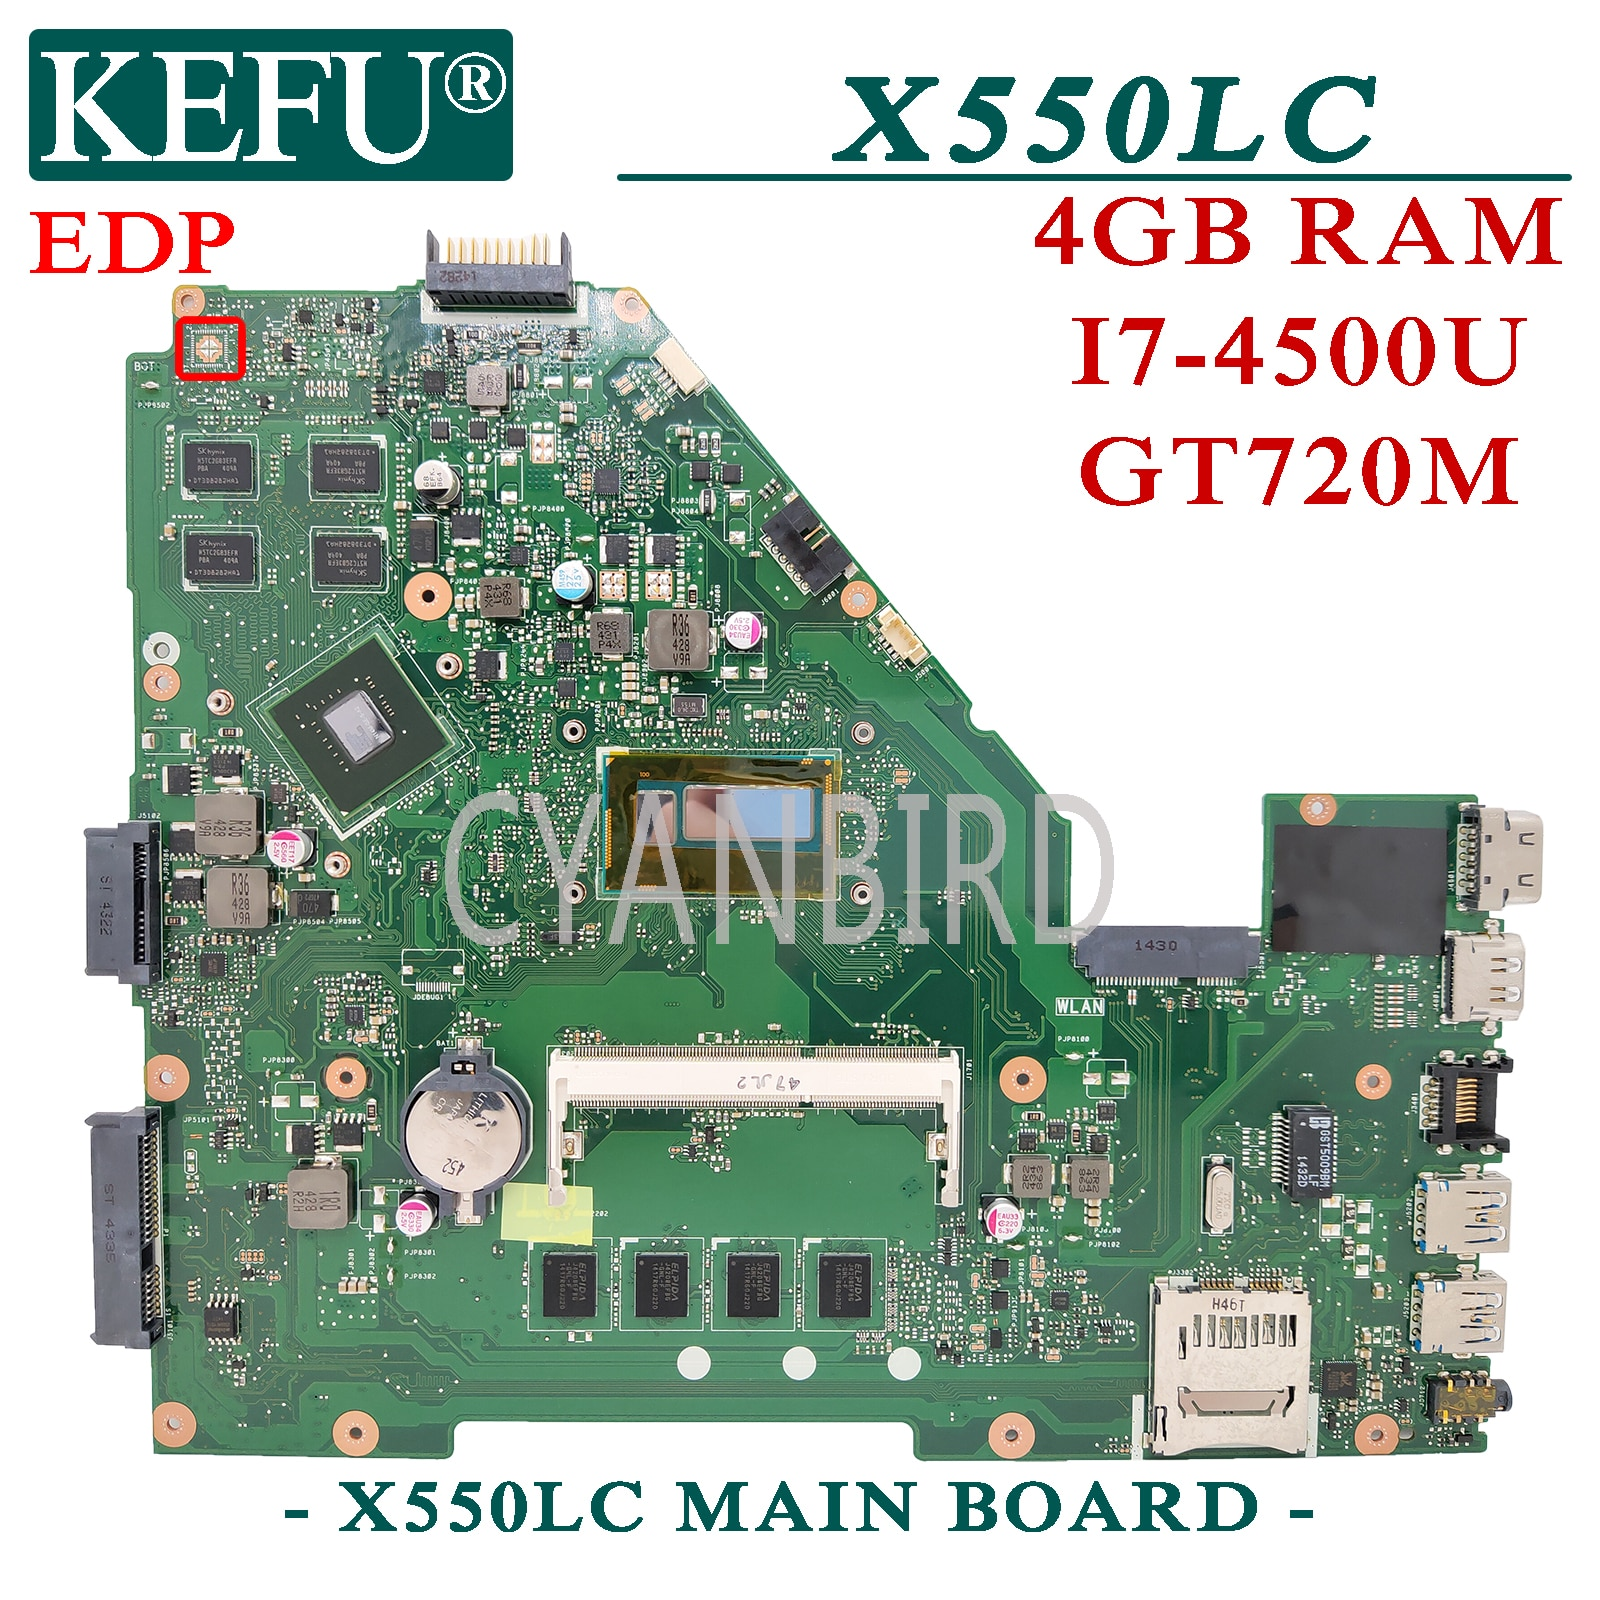 KEFU X550LC الأصلي اللوحة الرئيسية ل ASUS X550LC X550LD X550LN X550L مع I7-4500U GT720M EDP اللوحة الأم للكمبيوتر المحمول